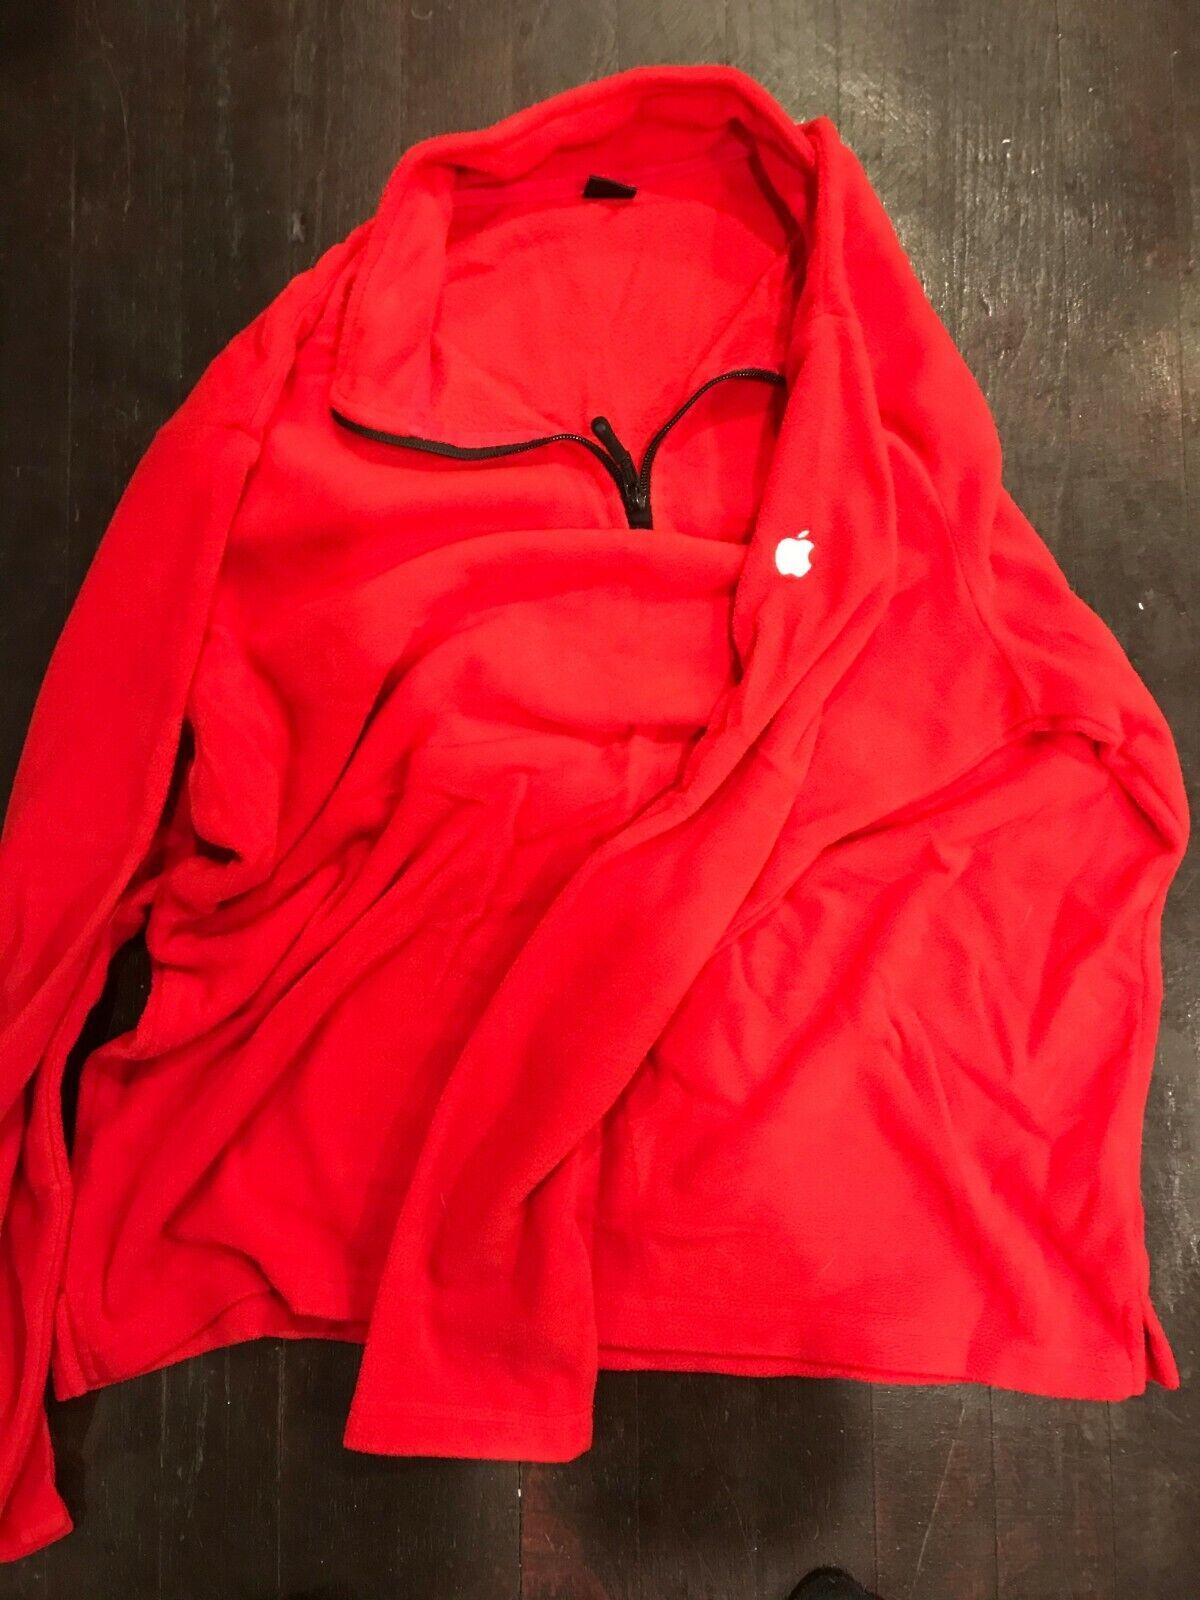 Apple Retail Logo Fleece Pullover Jacket Apparel Red Blue